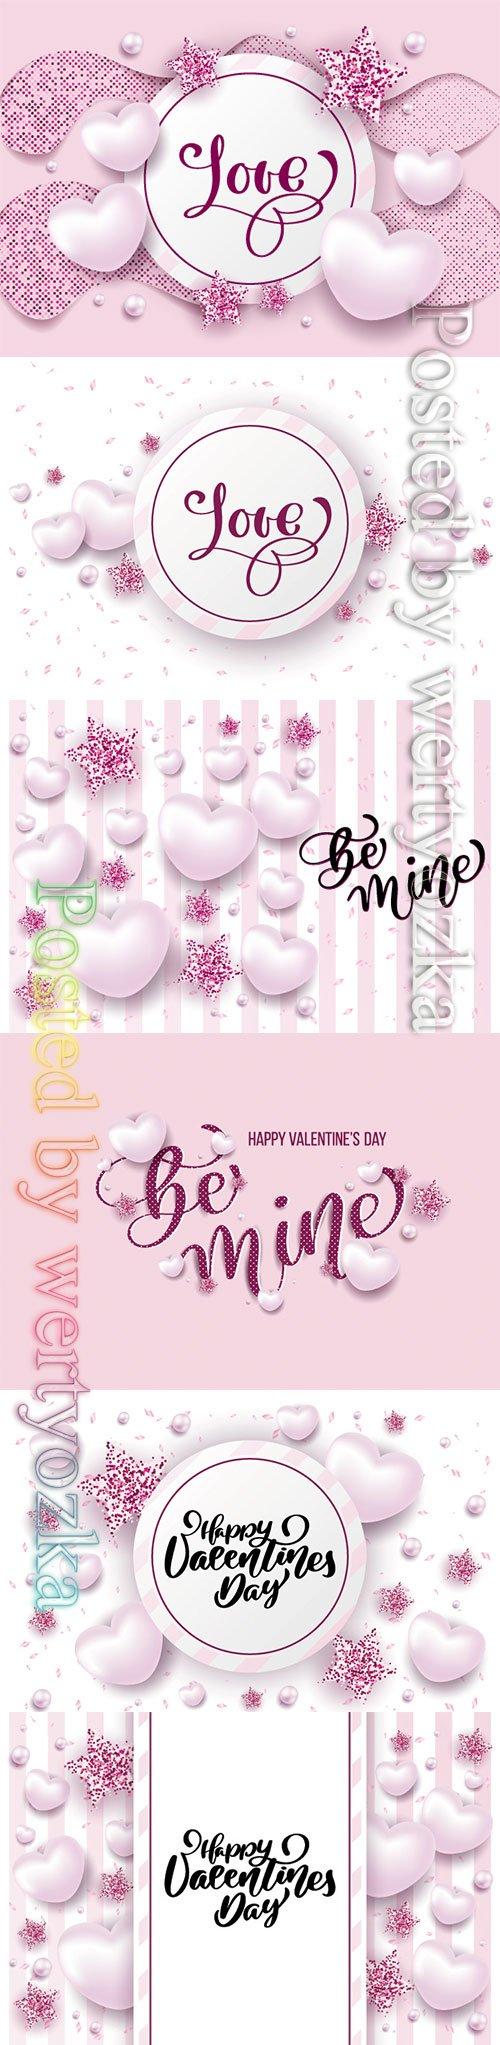 Happy valentine day festive sparkle layout template design